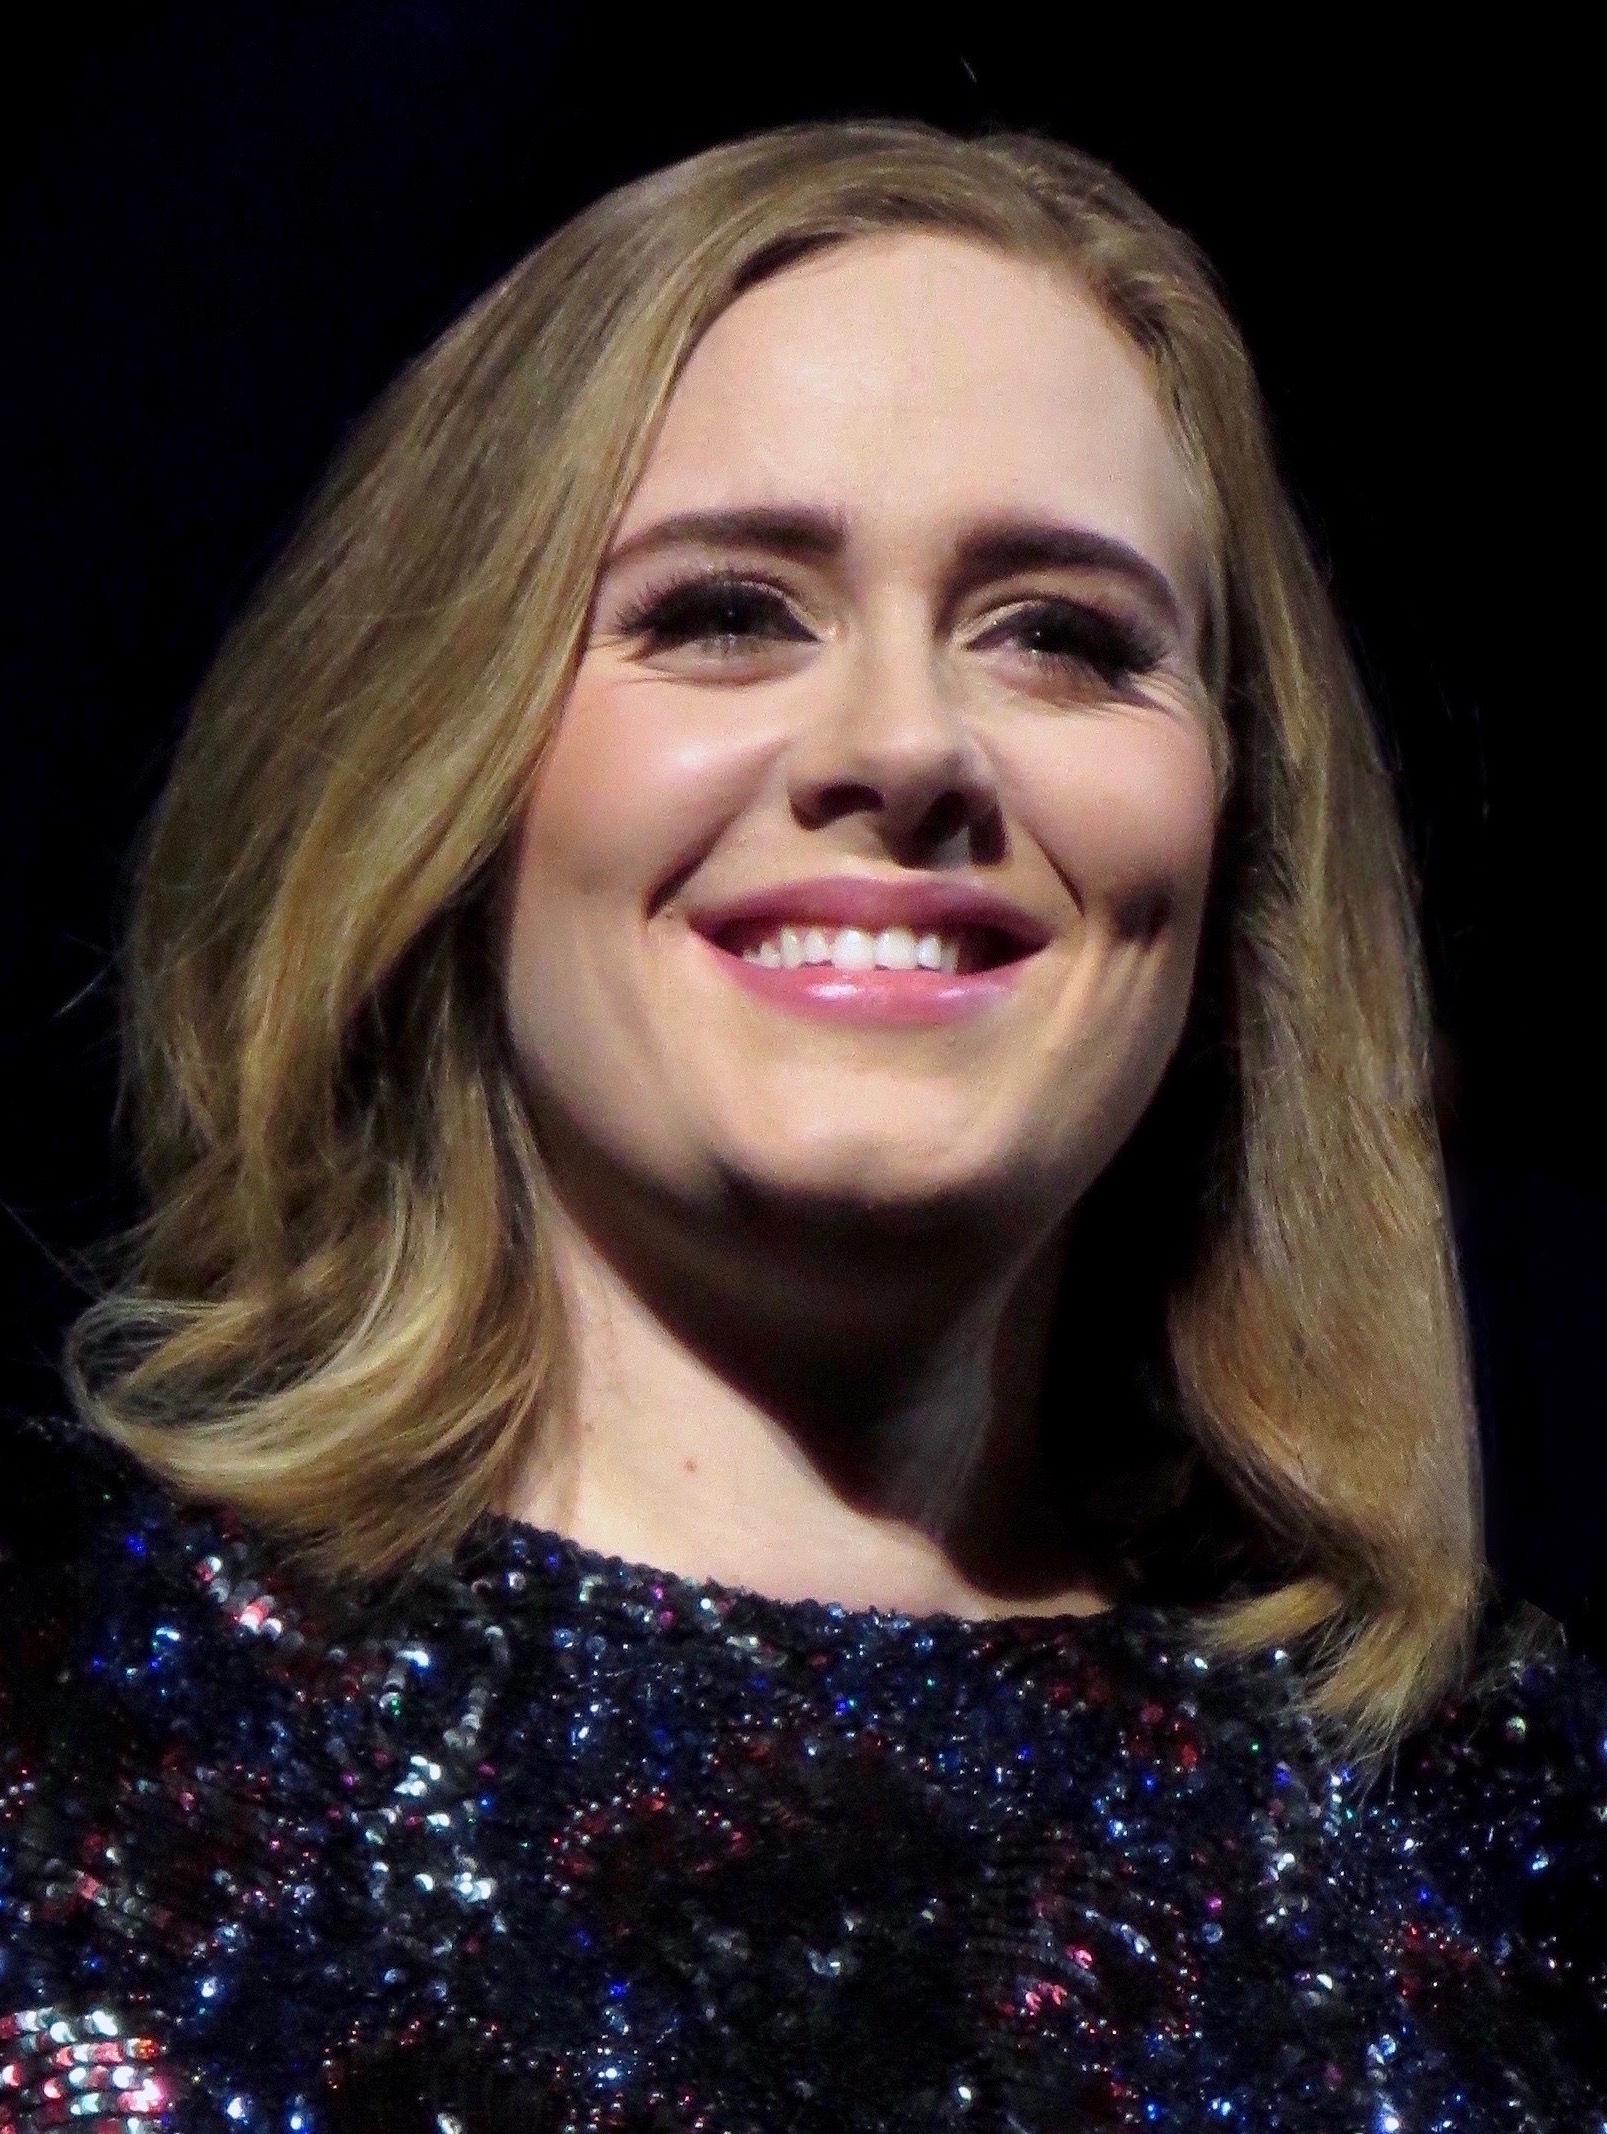 Photo of Adele: British singer-songwriter